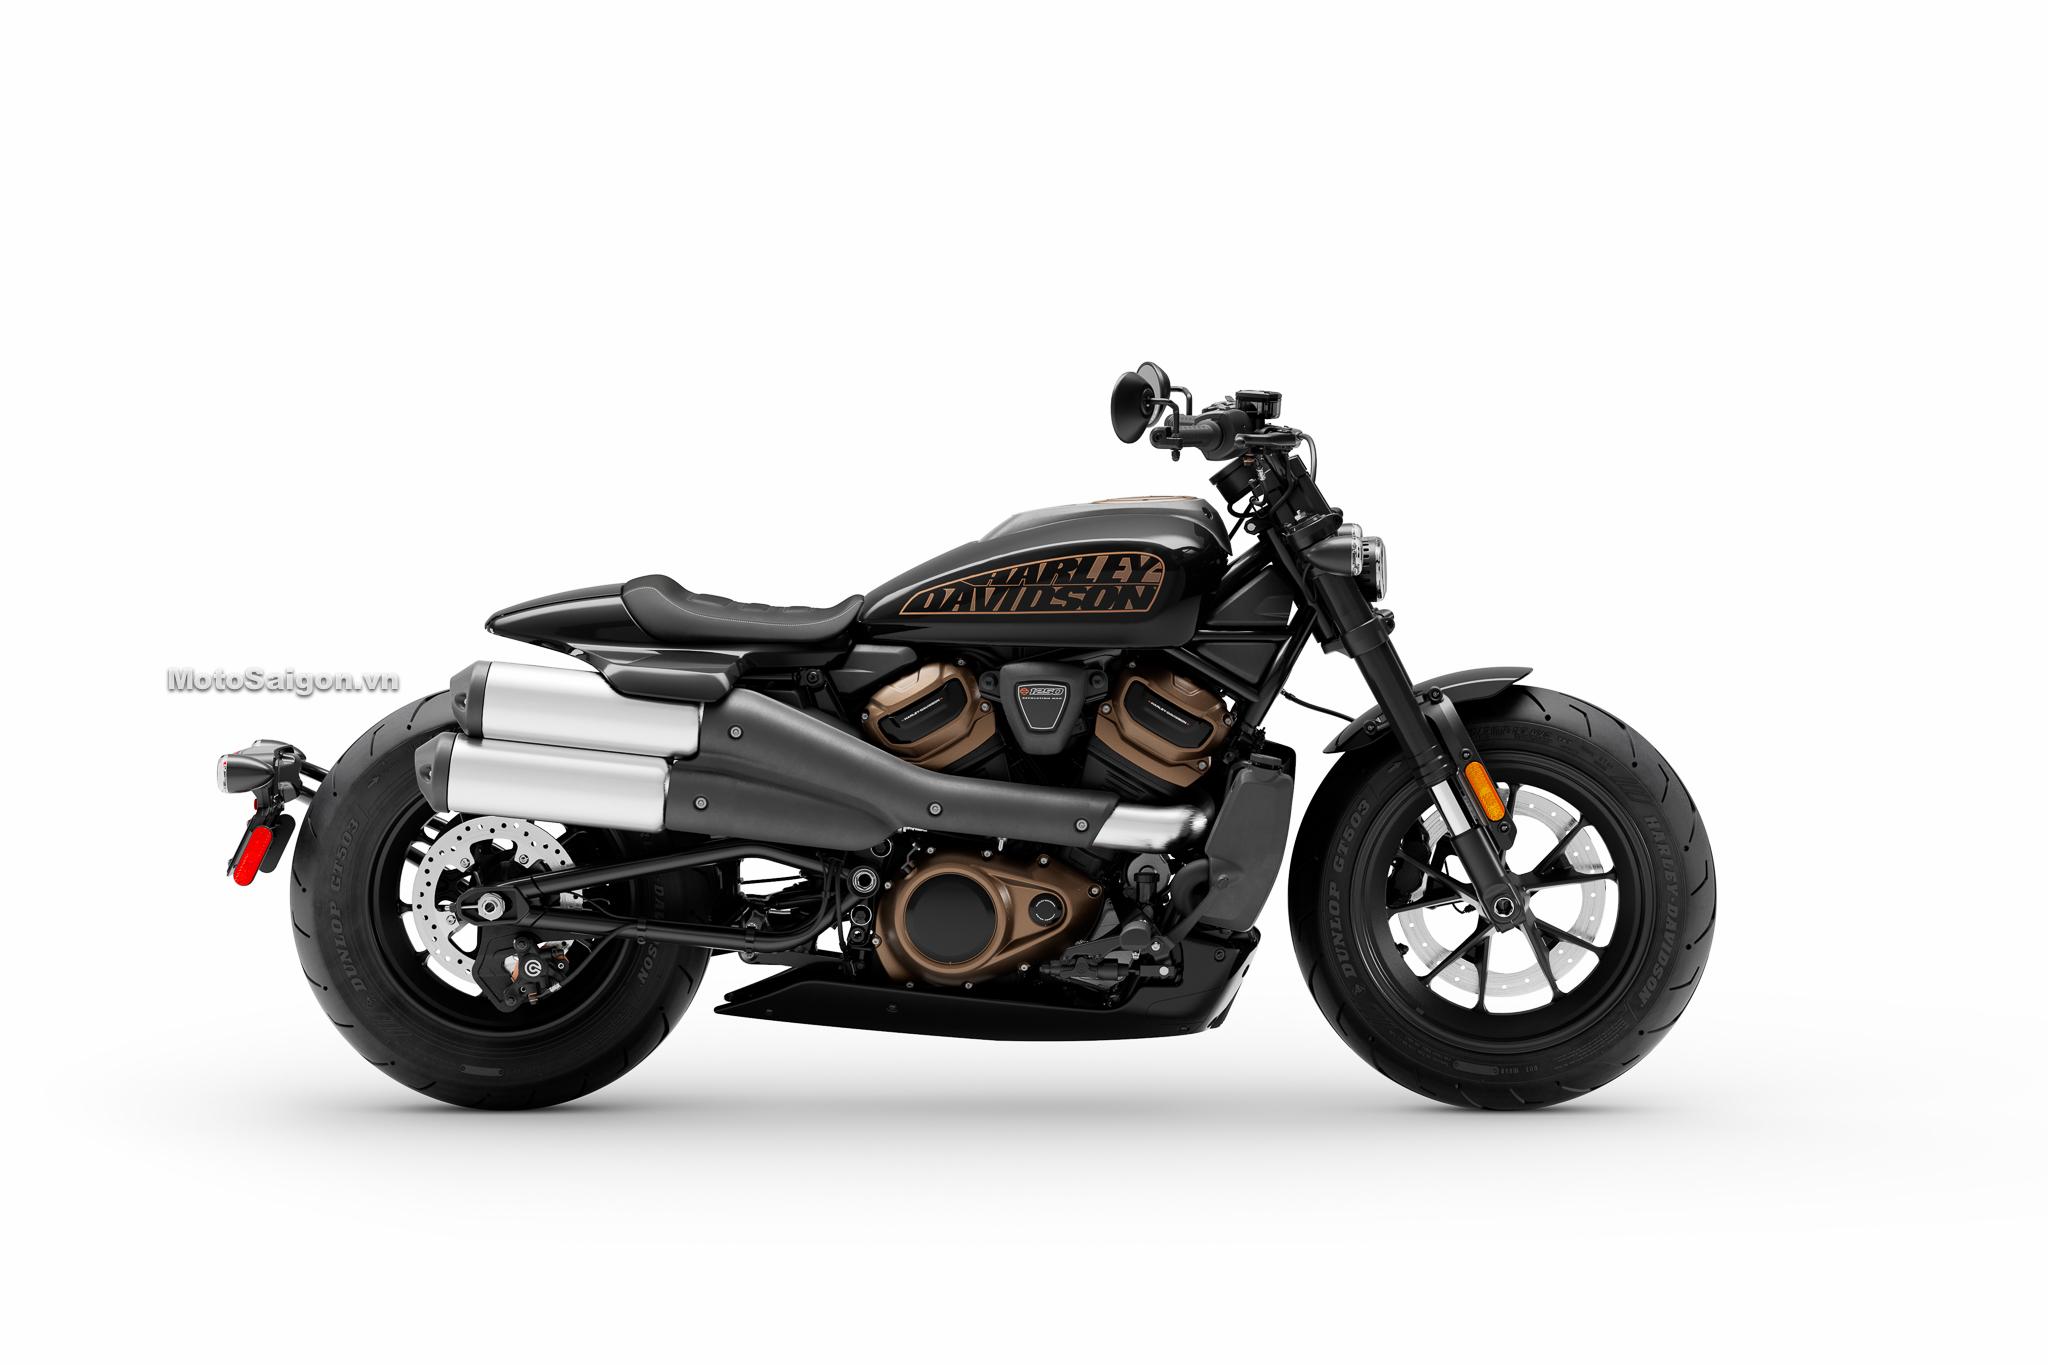 Harley-Davidson Sportster S màu đen